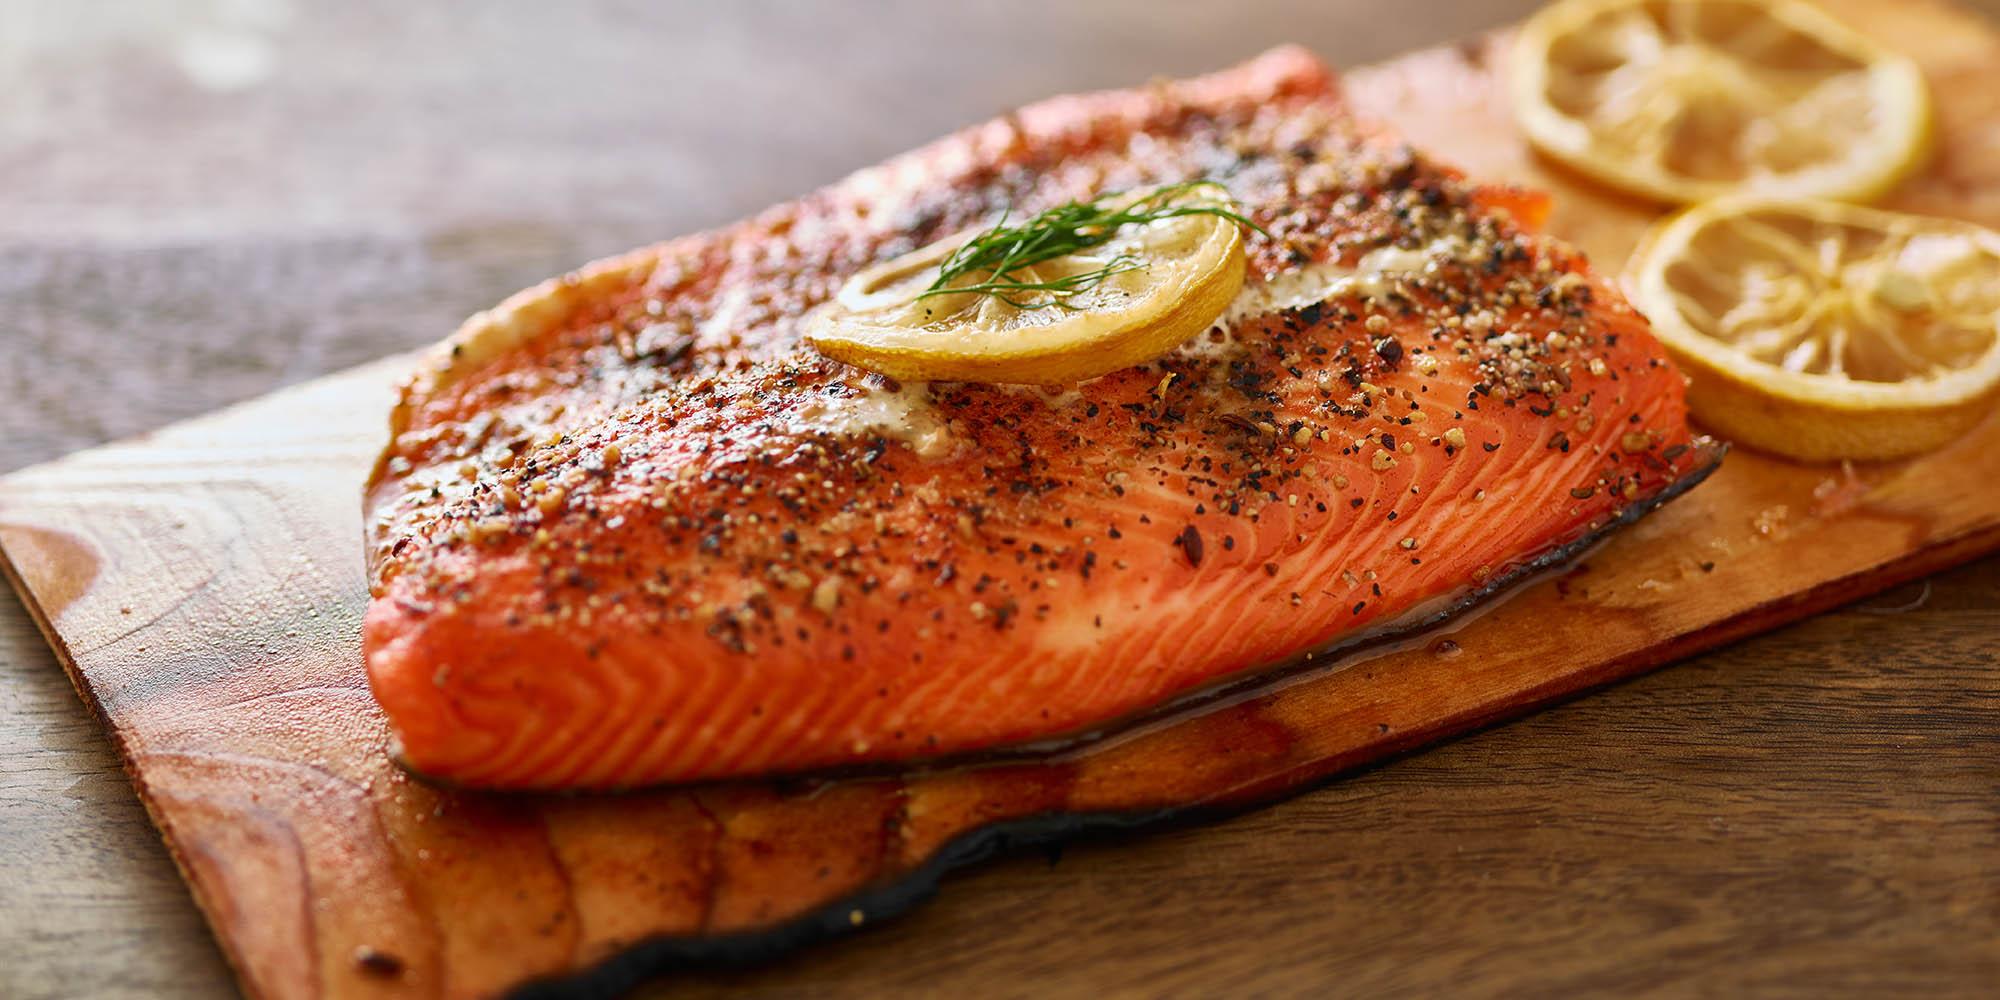 Cedar Plank Salmon with Maple Glaze